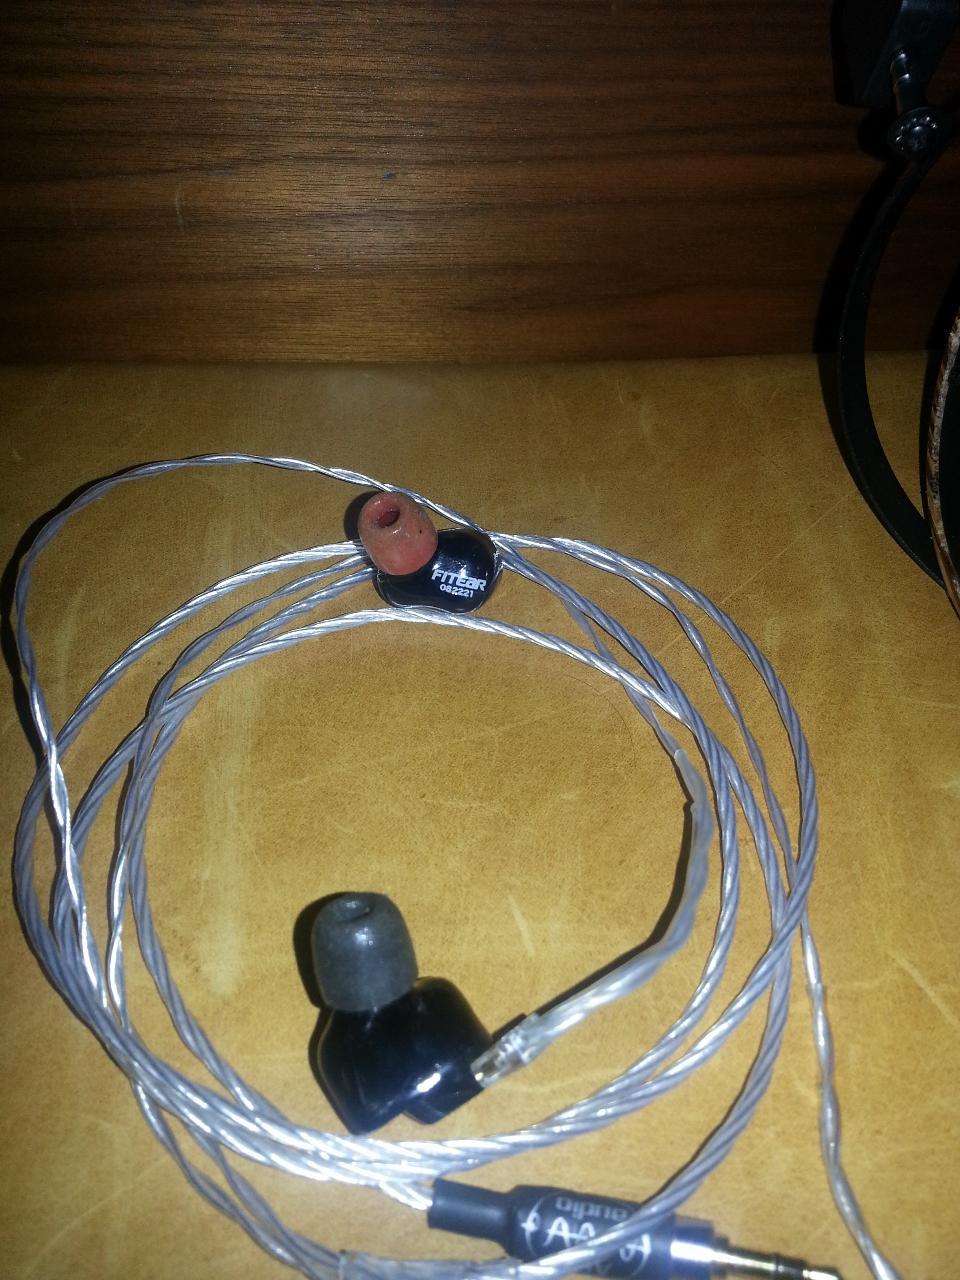 FitEar ToGO 334 w/ALO SXC 24 IEM Cable